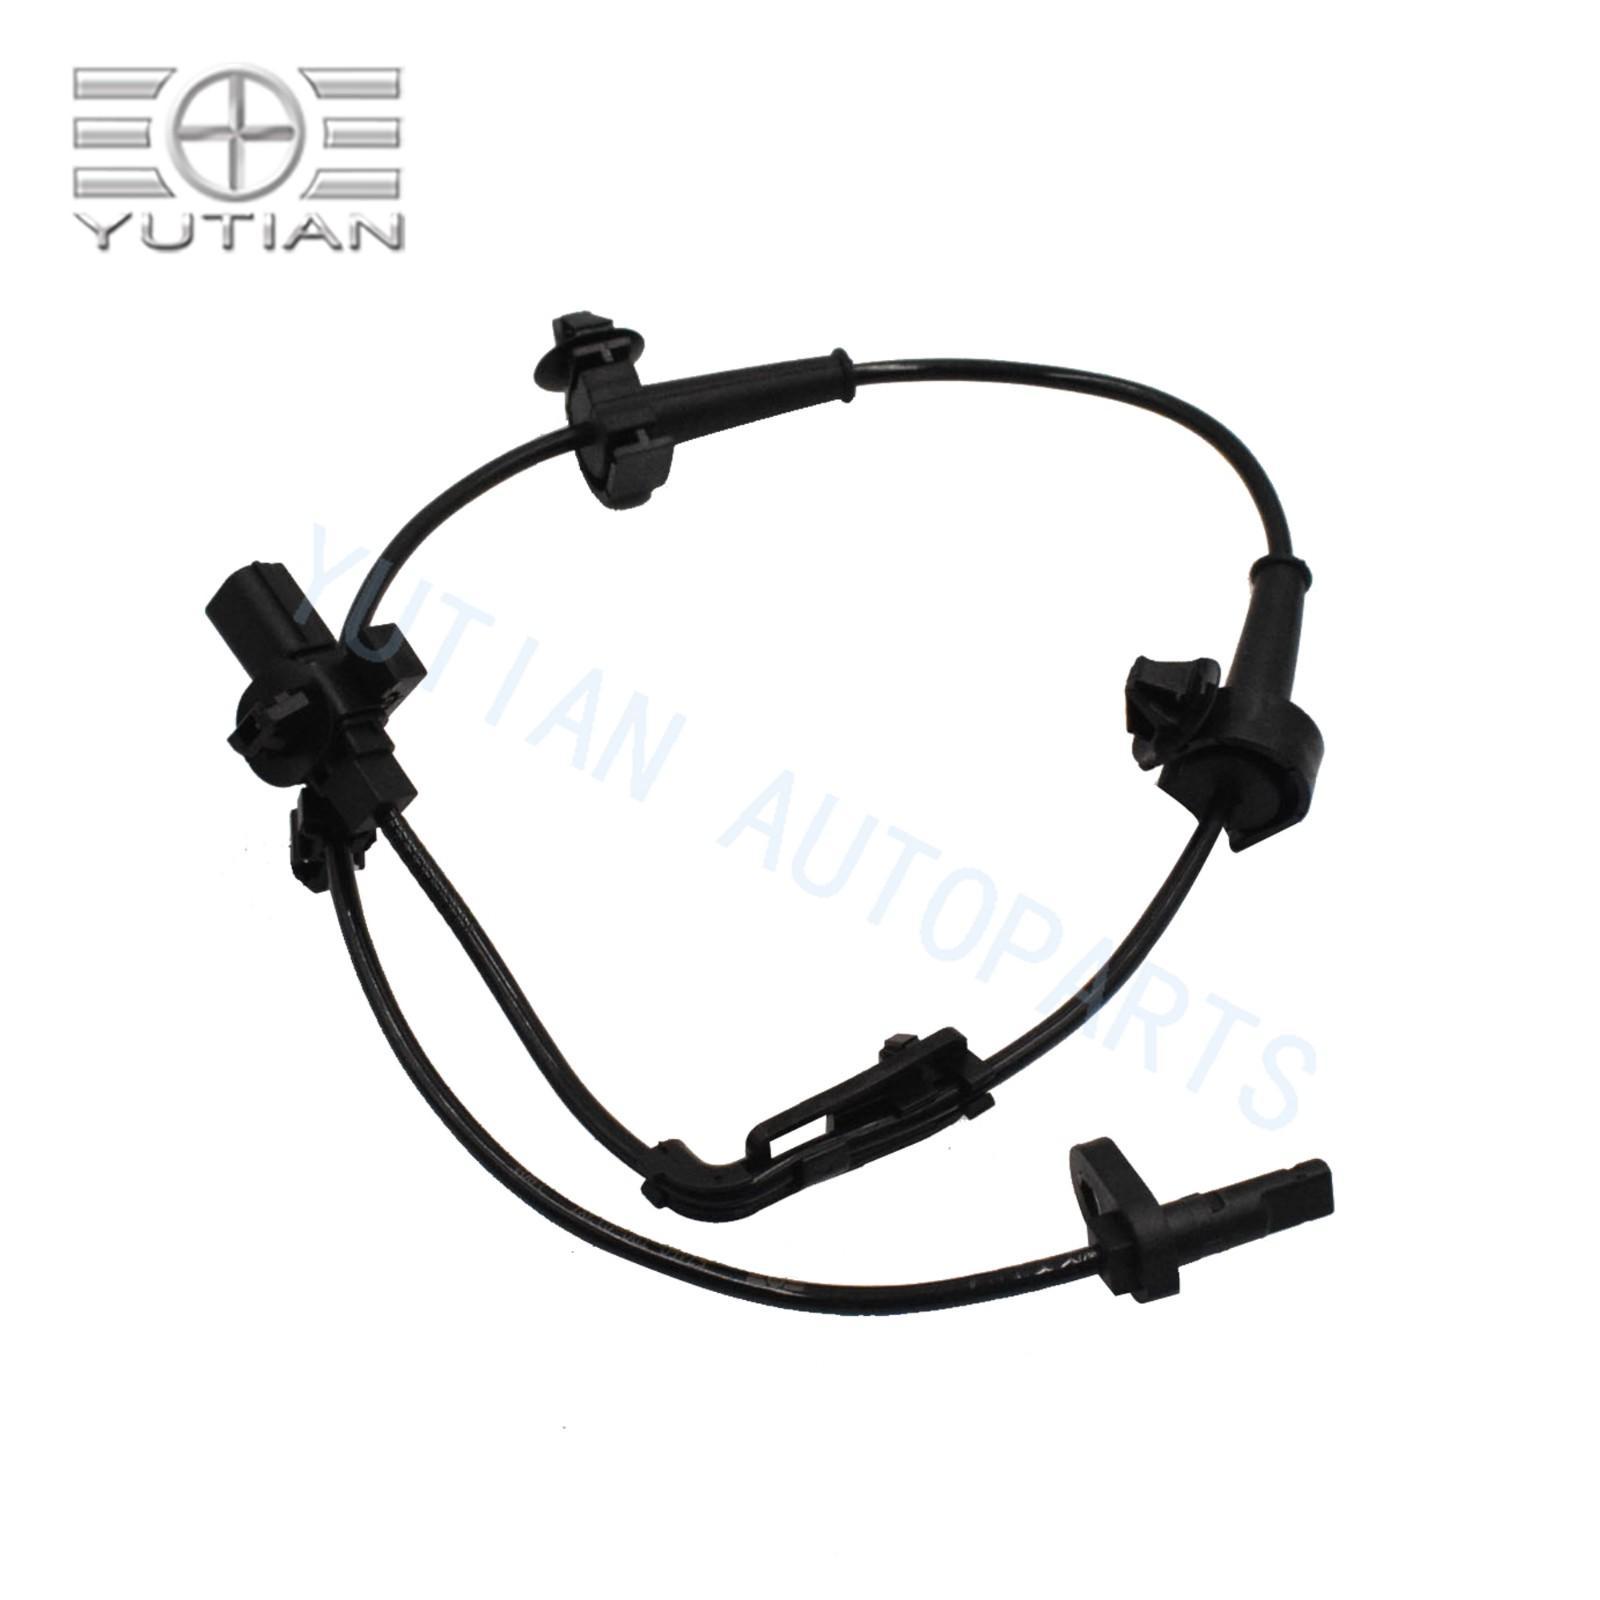 sensor oem Yutian Brand abs sensor cost factory